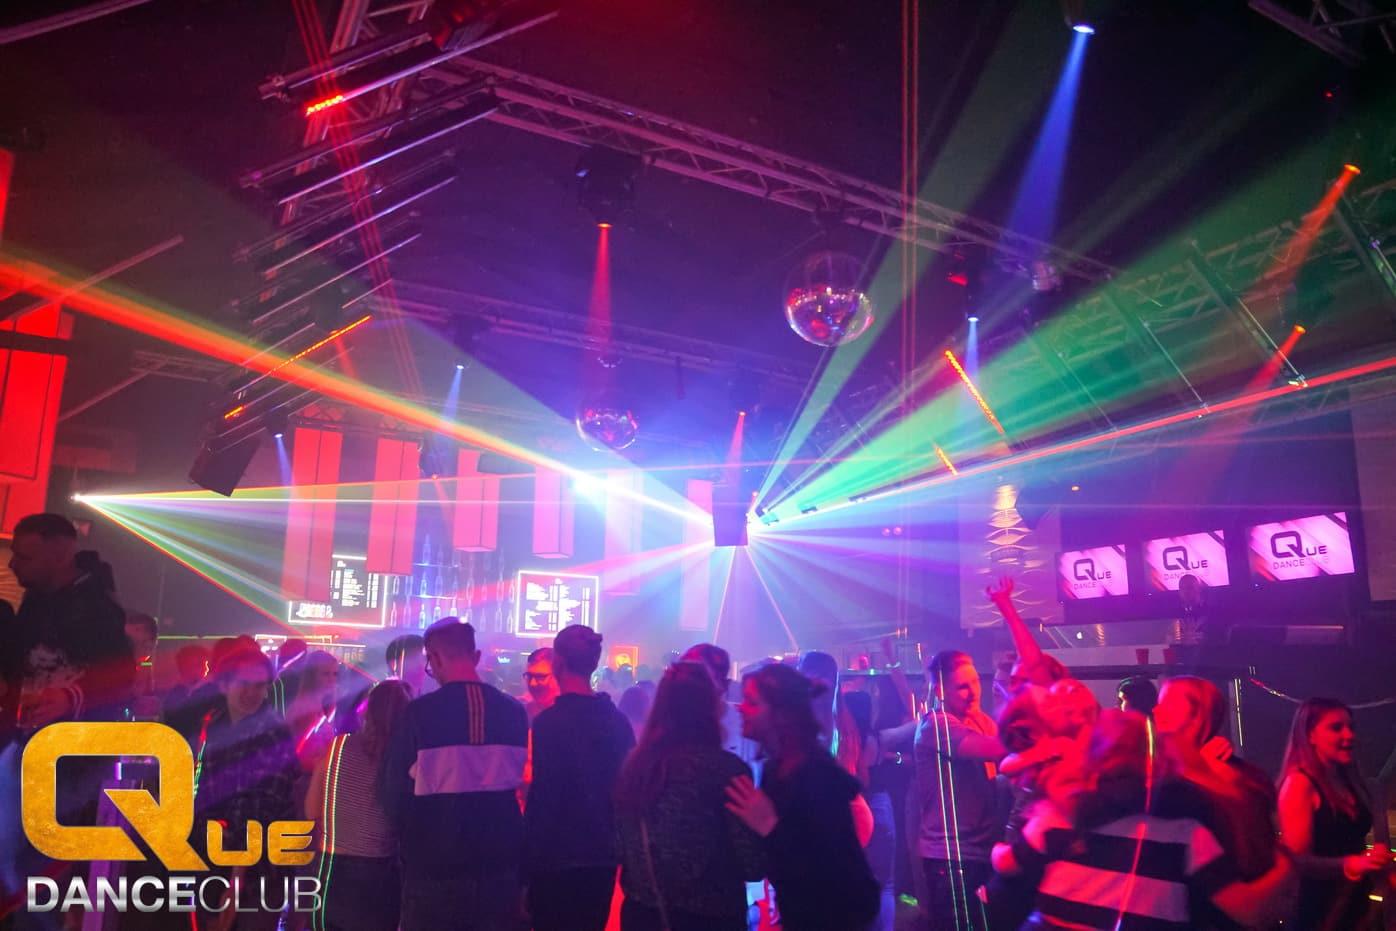 2019_02_15_Que_Danceclub_Secret_Kiss_Nightlife_Scene_Timo_023